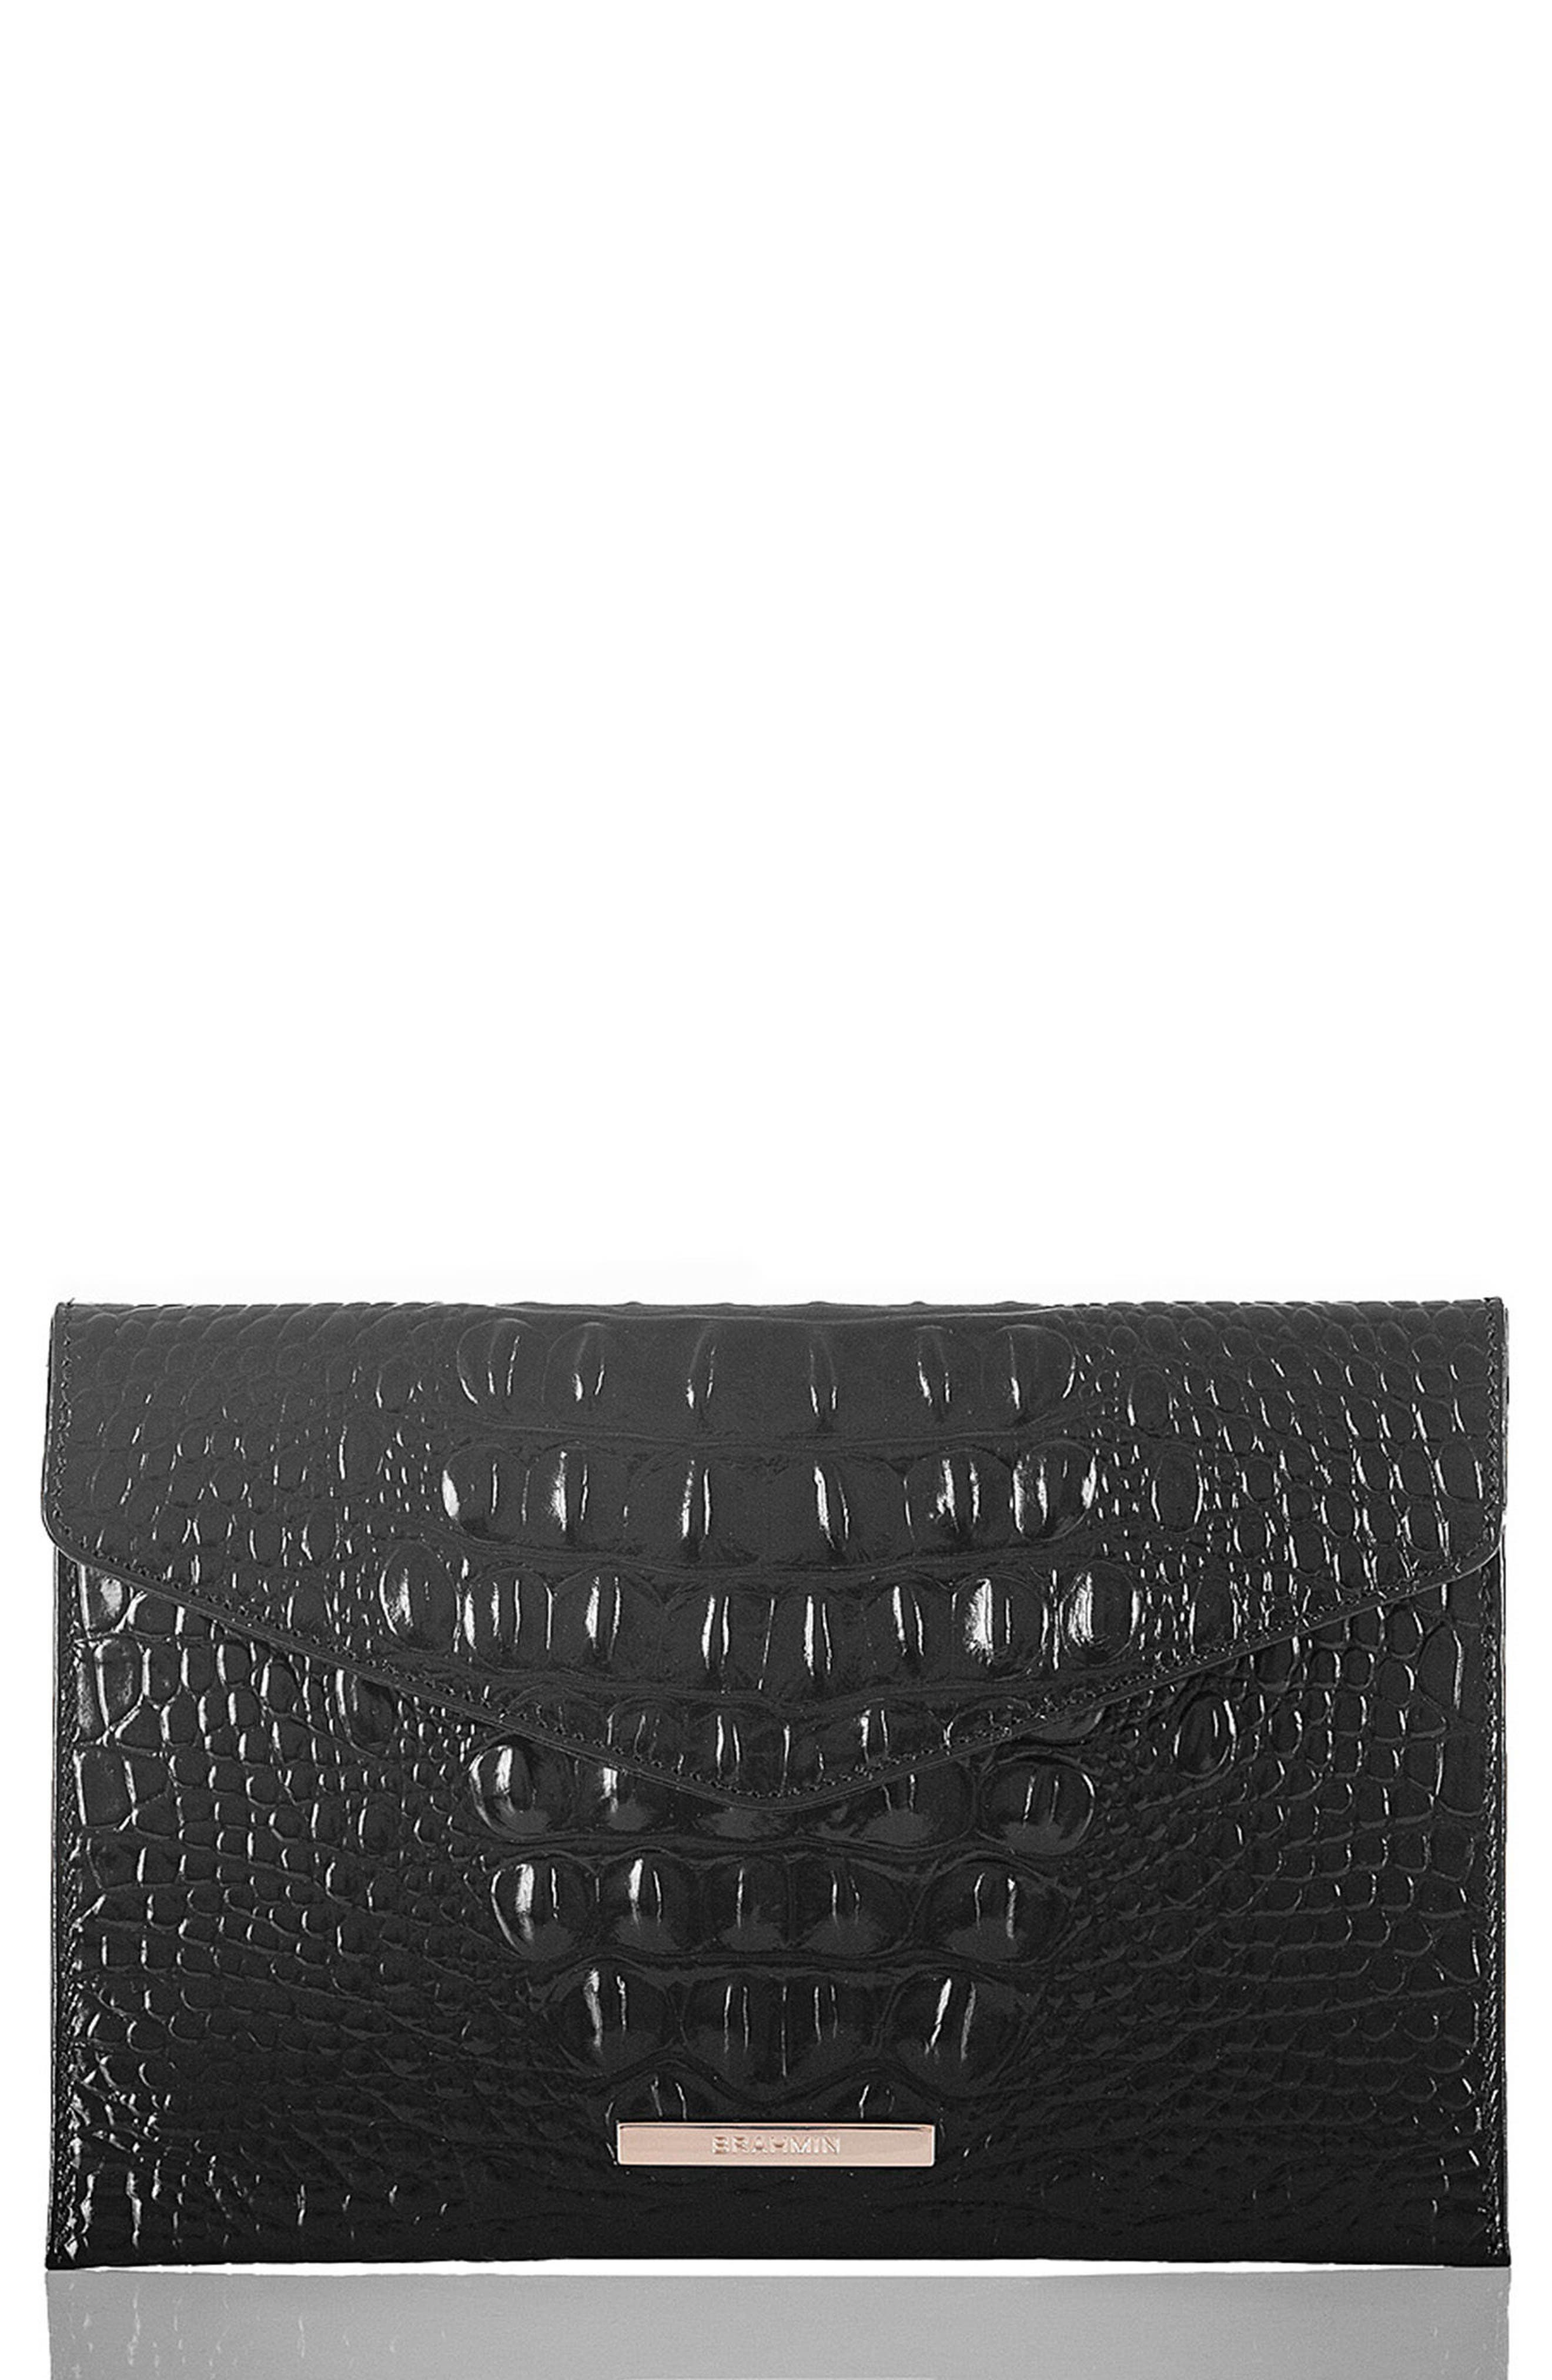 Melbourne Croc Embossed Leather Envelope Clutch,                         Main,                         color, BLACK